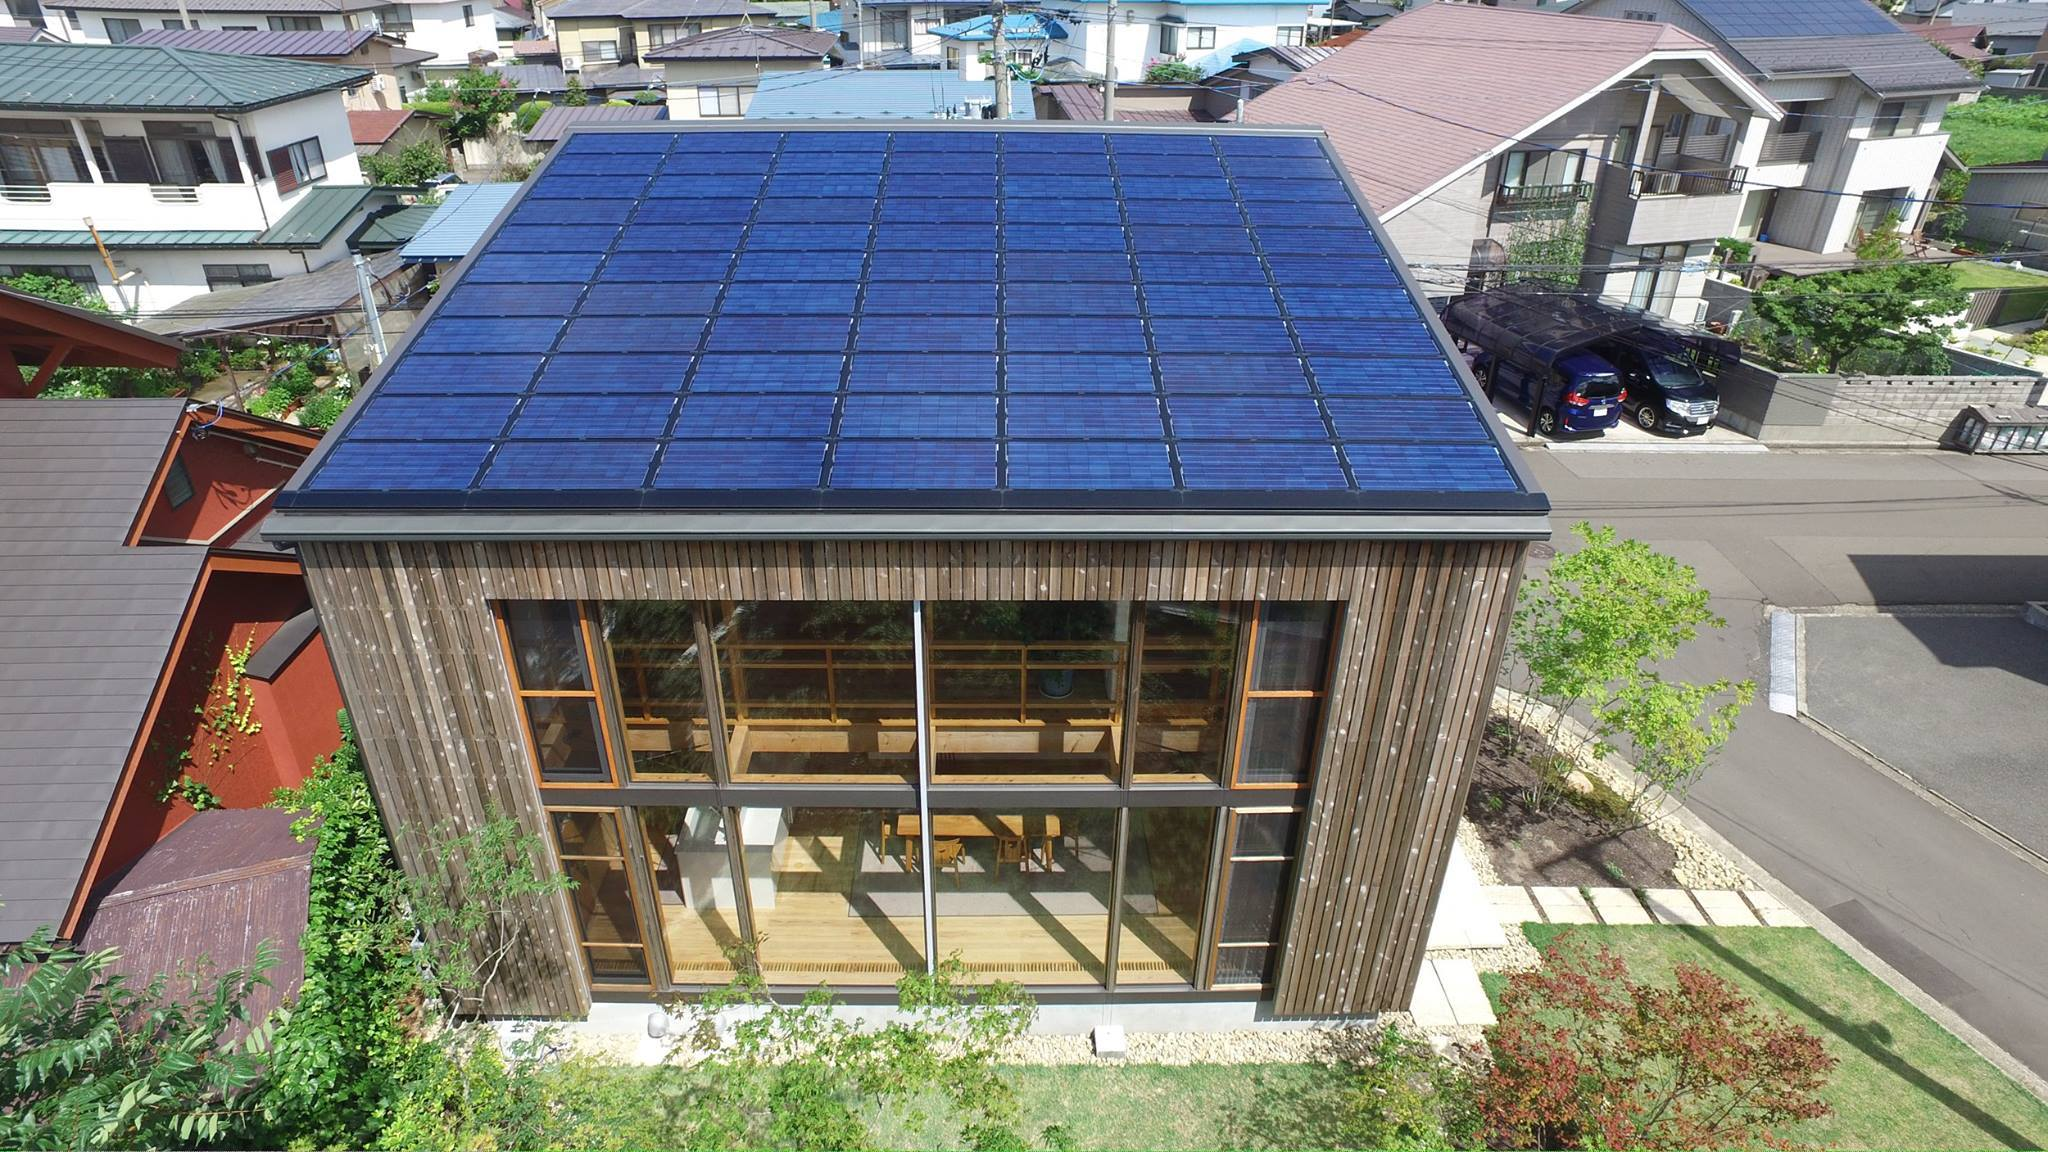 RealZEH・Q1住宅モデル能代:太陽光発電売価と消費量の買価_e0054299_15120662.jpg